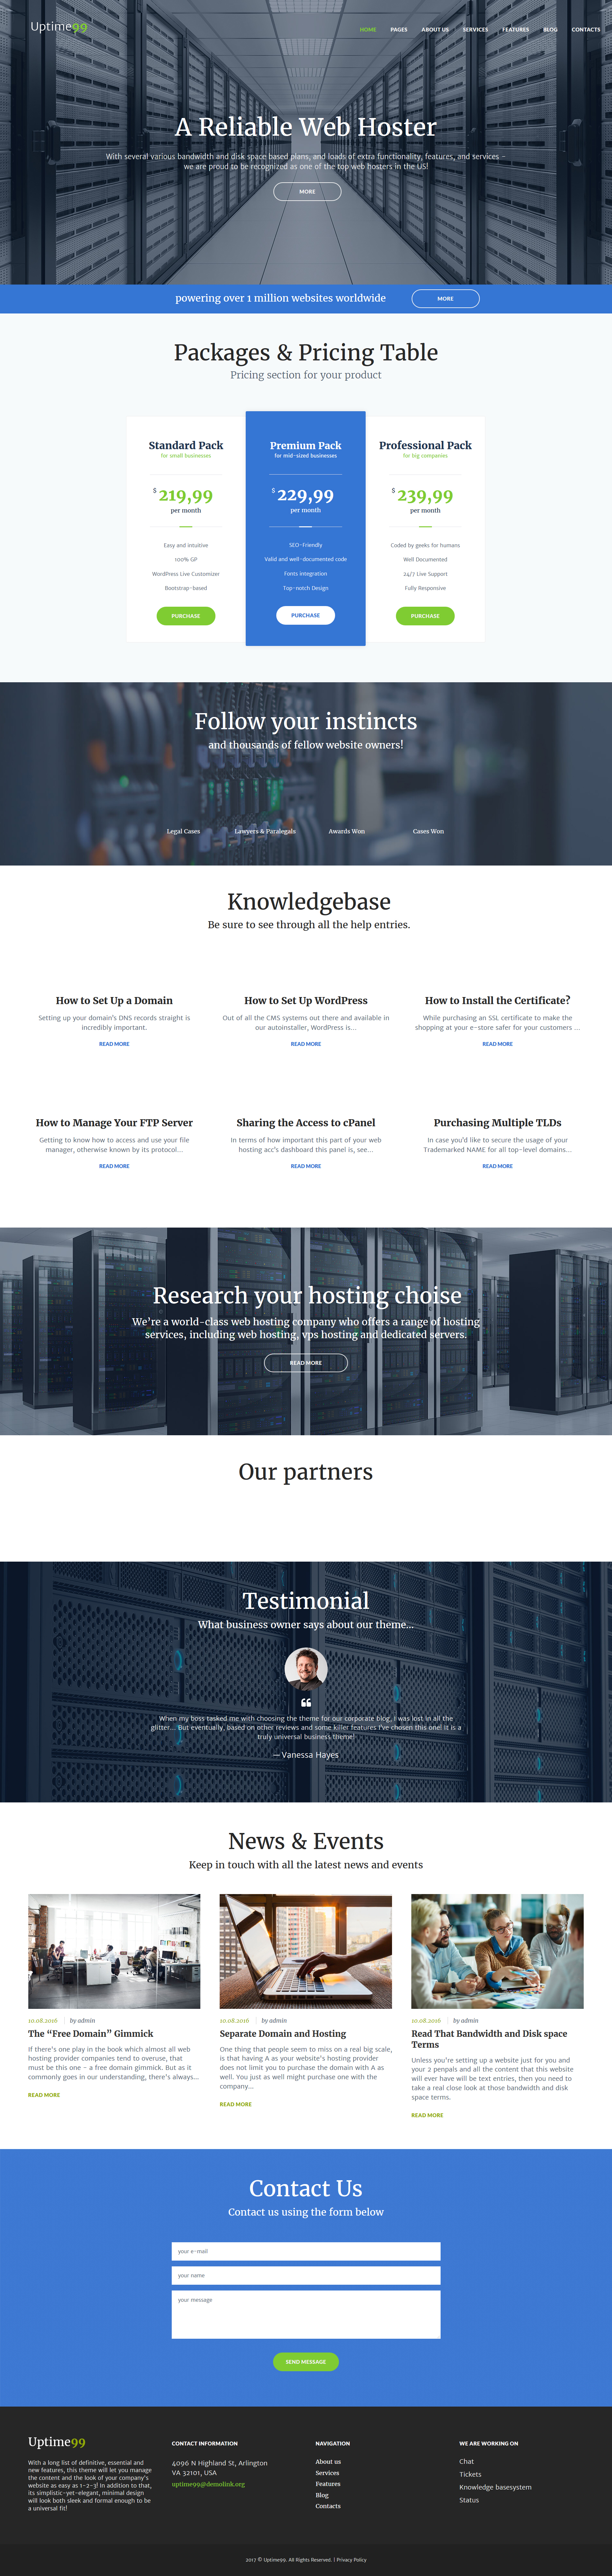 """Uptime99 - Web Hosting"" Responsive WordPress thema №61264 - screenshot"